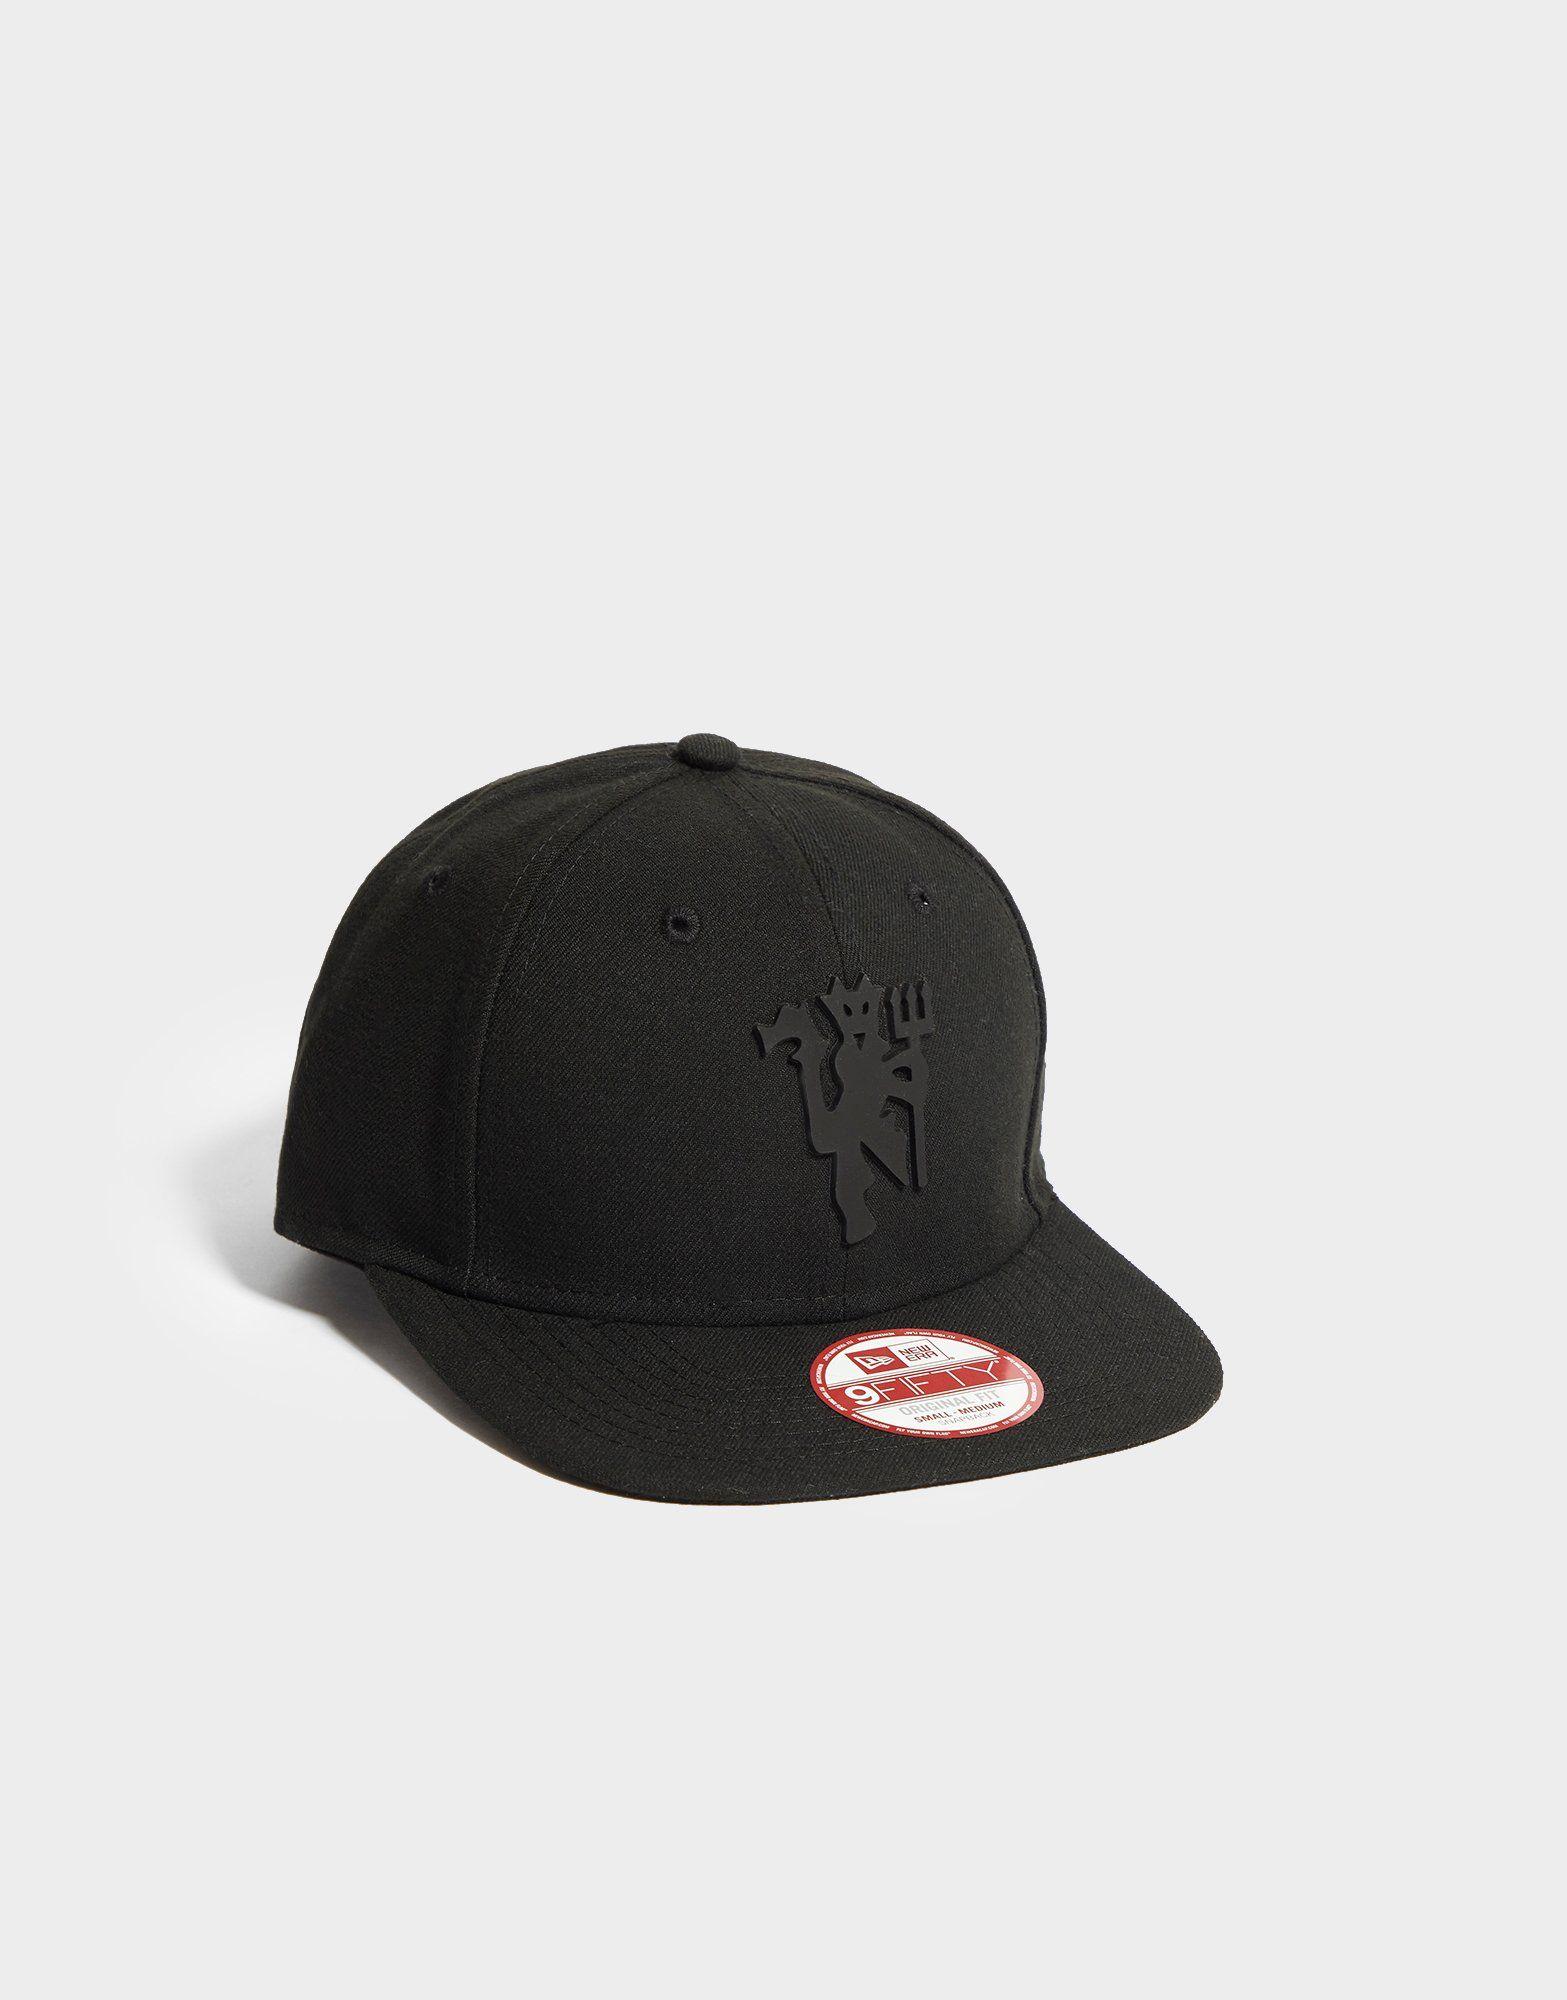 New Era Manchester United Black On Black Snapback Cap